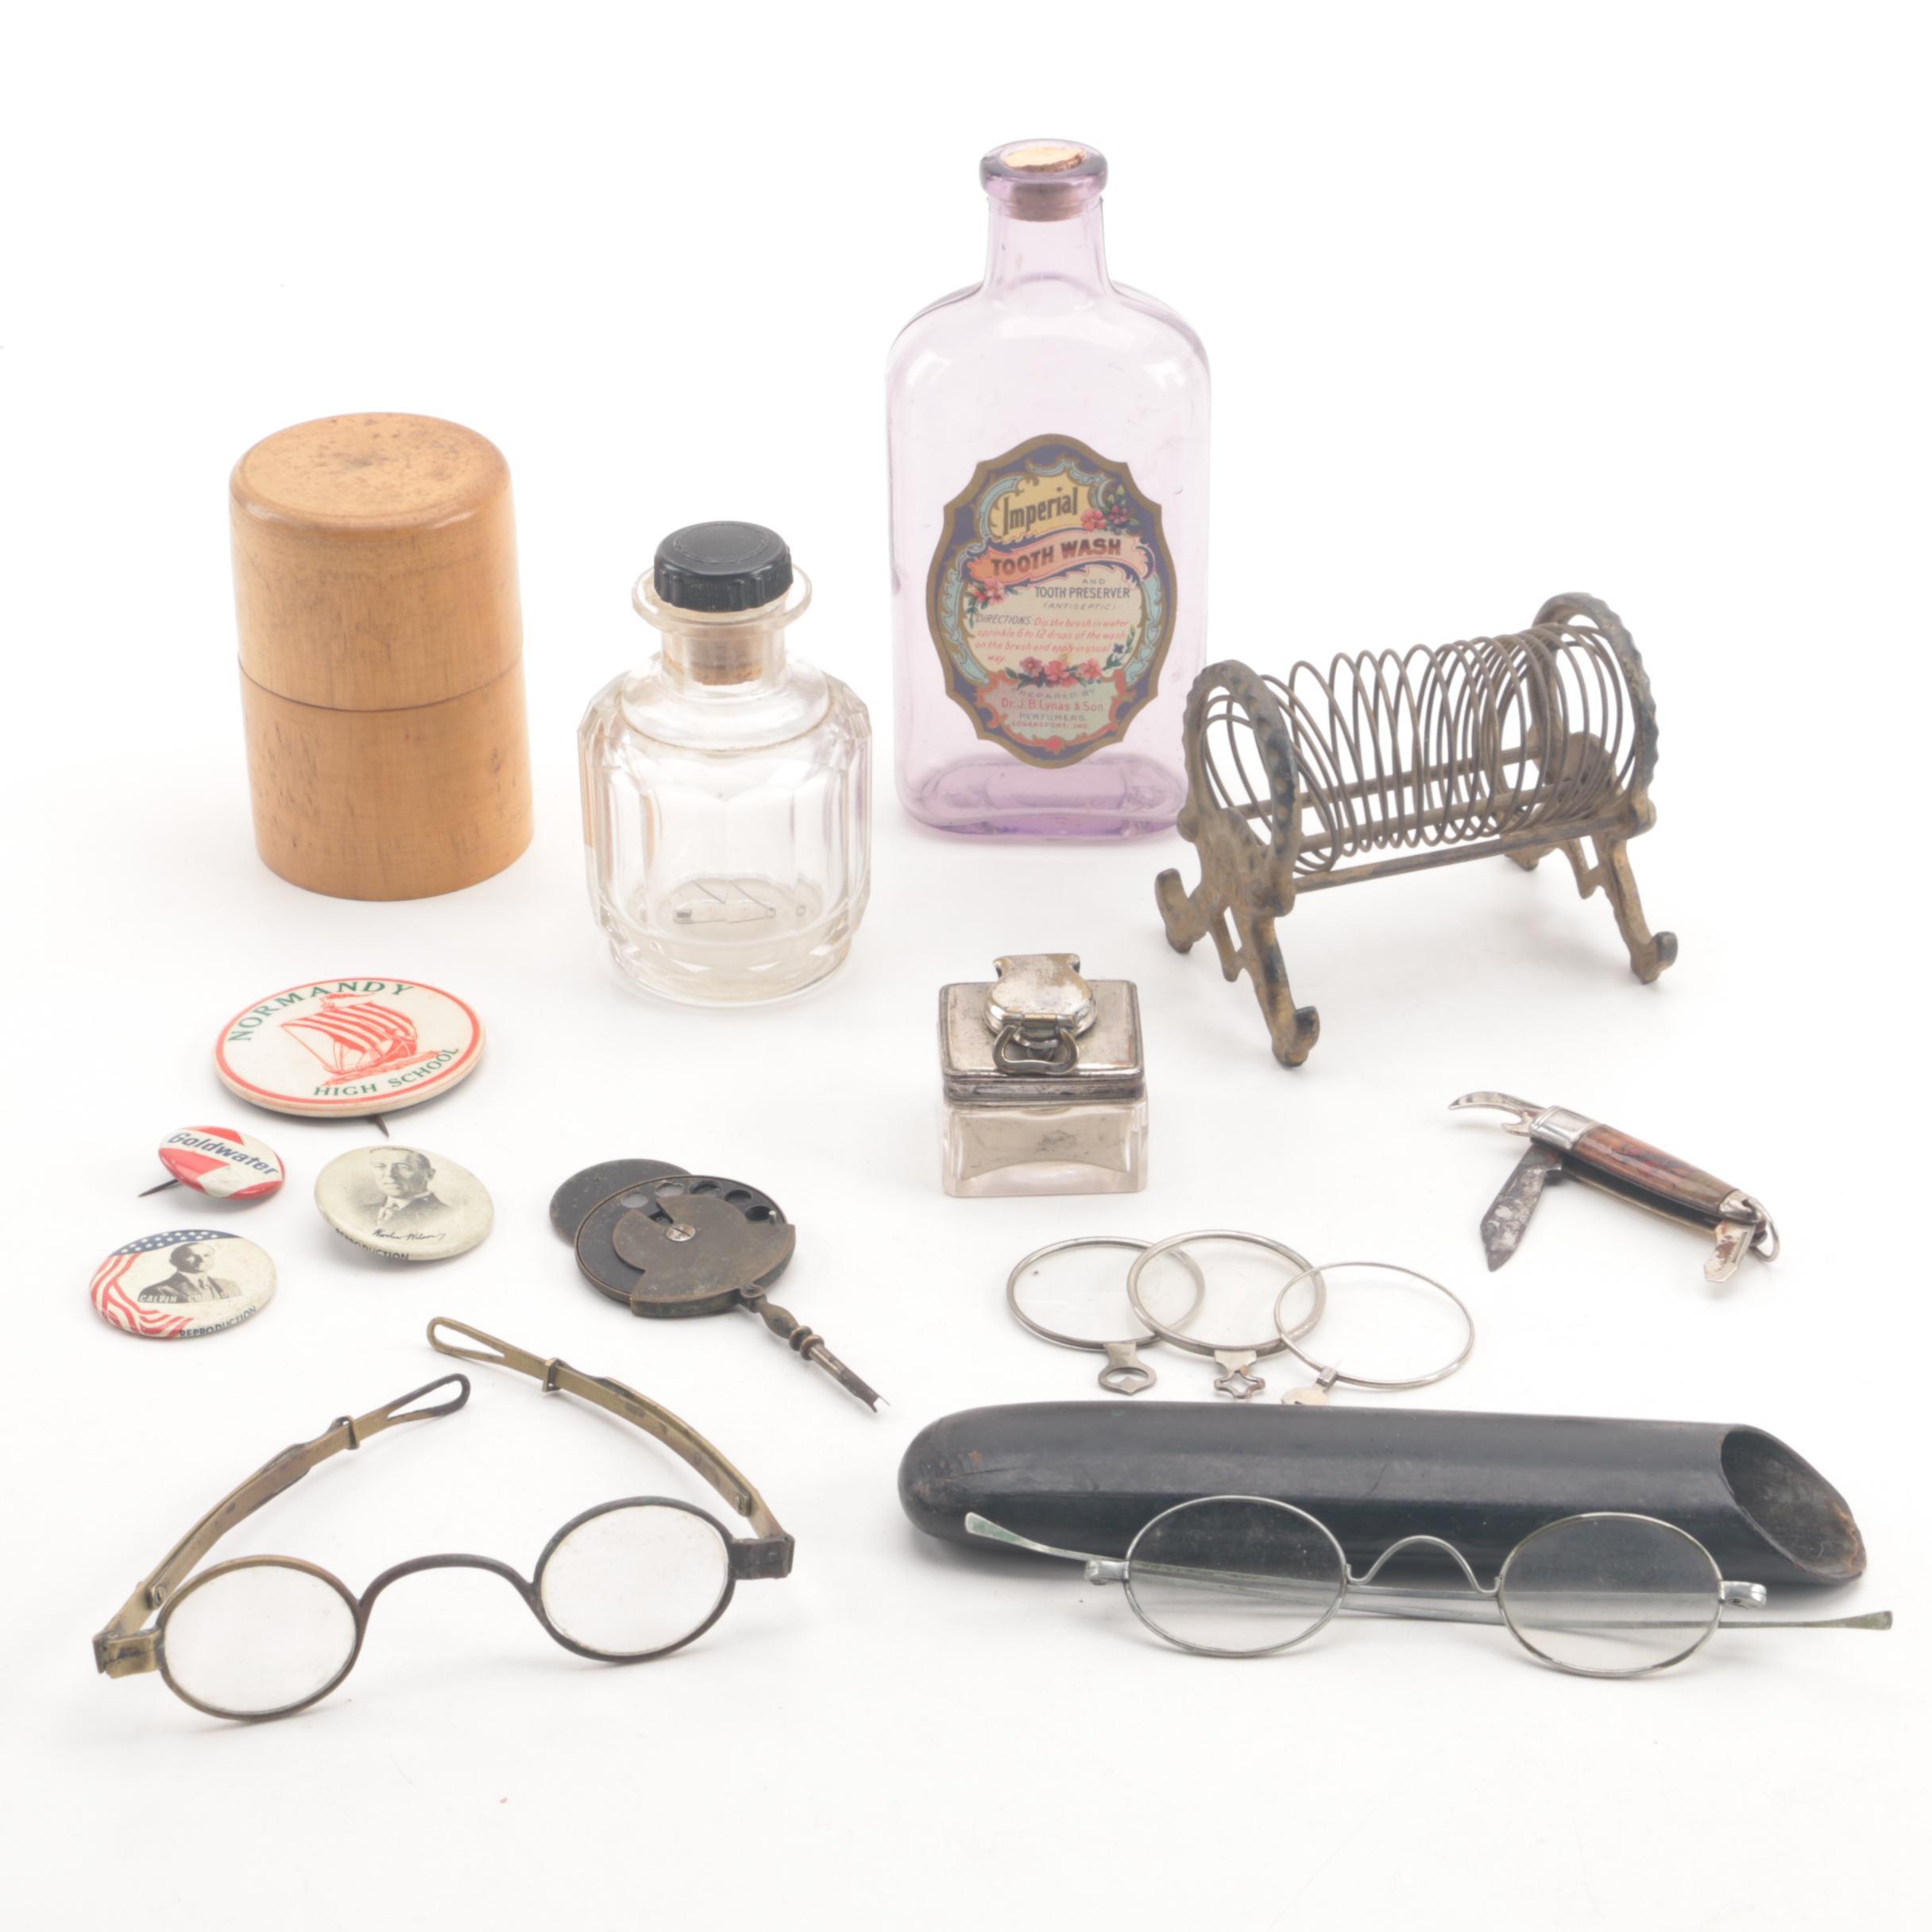 Antique K Diamond Cast Iron Letter Holder and Crank Bridge Metal Spectacles